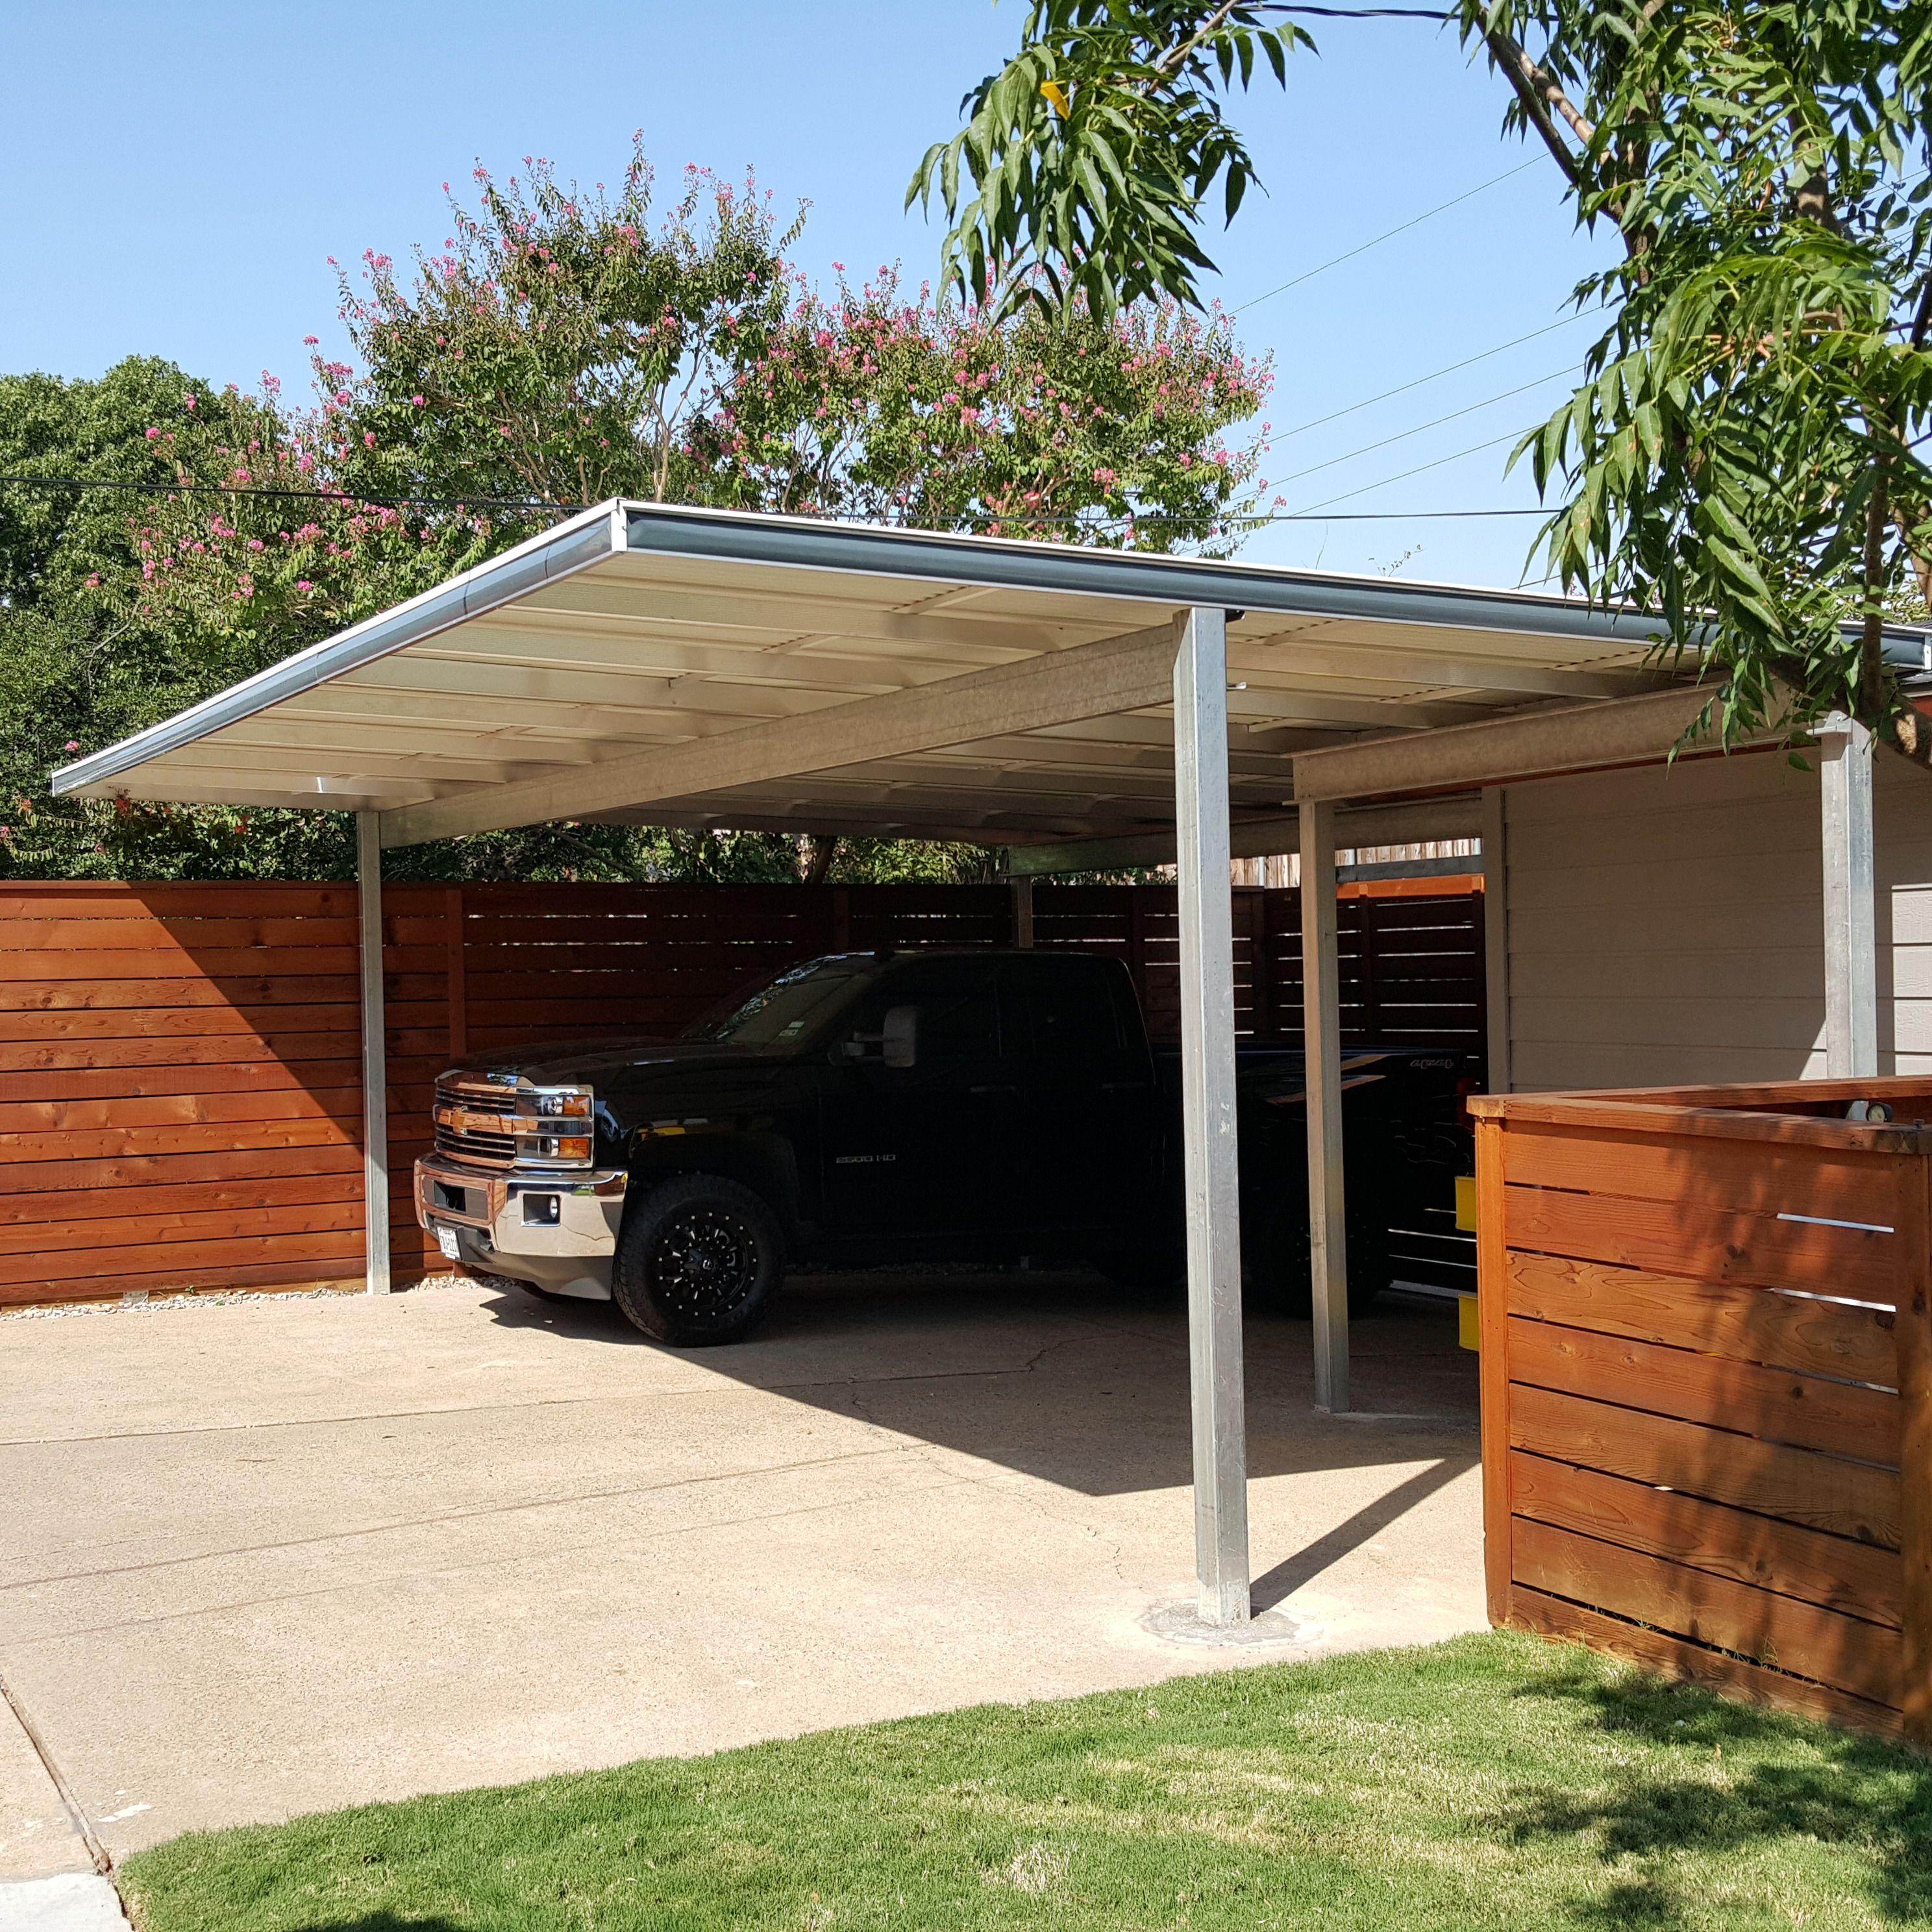 double carport (With images) Carport patio, Carport